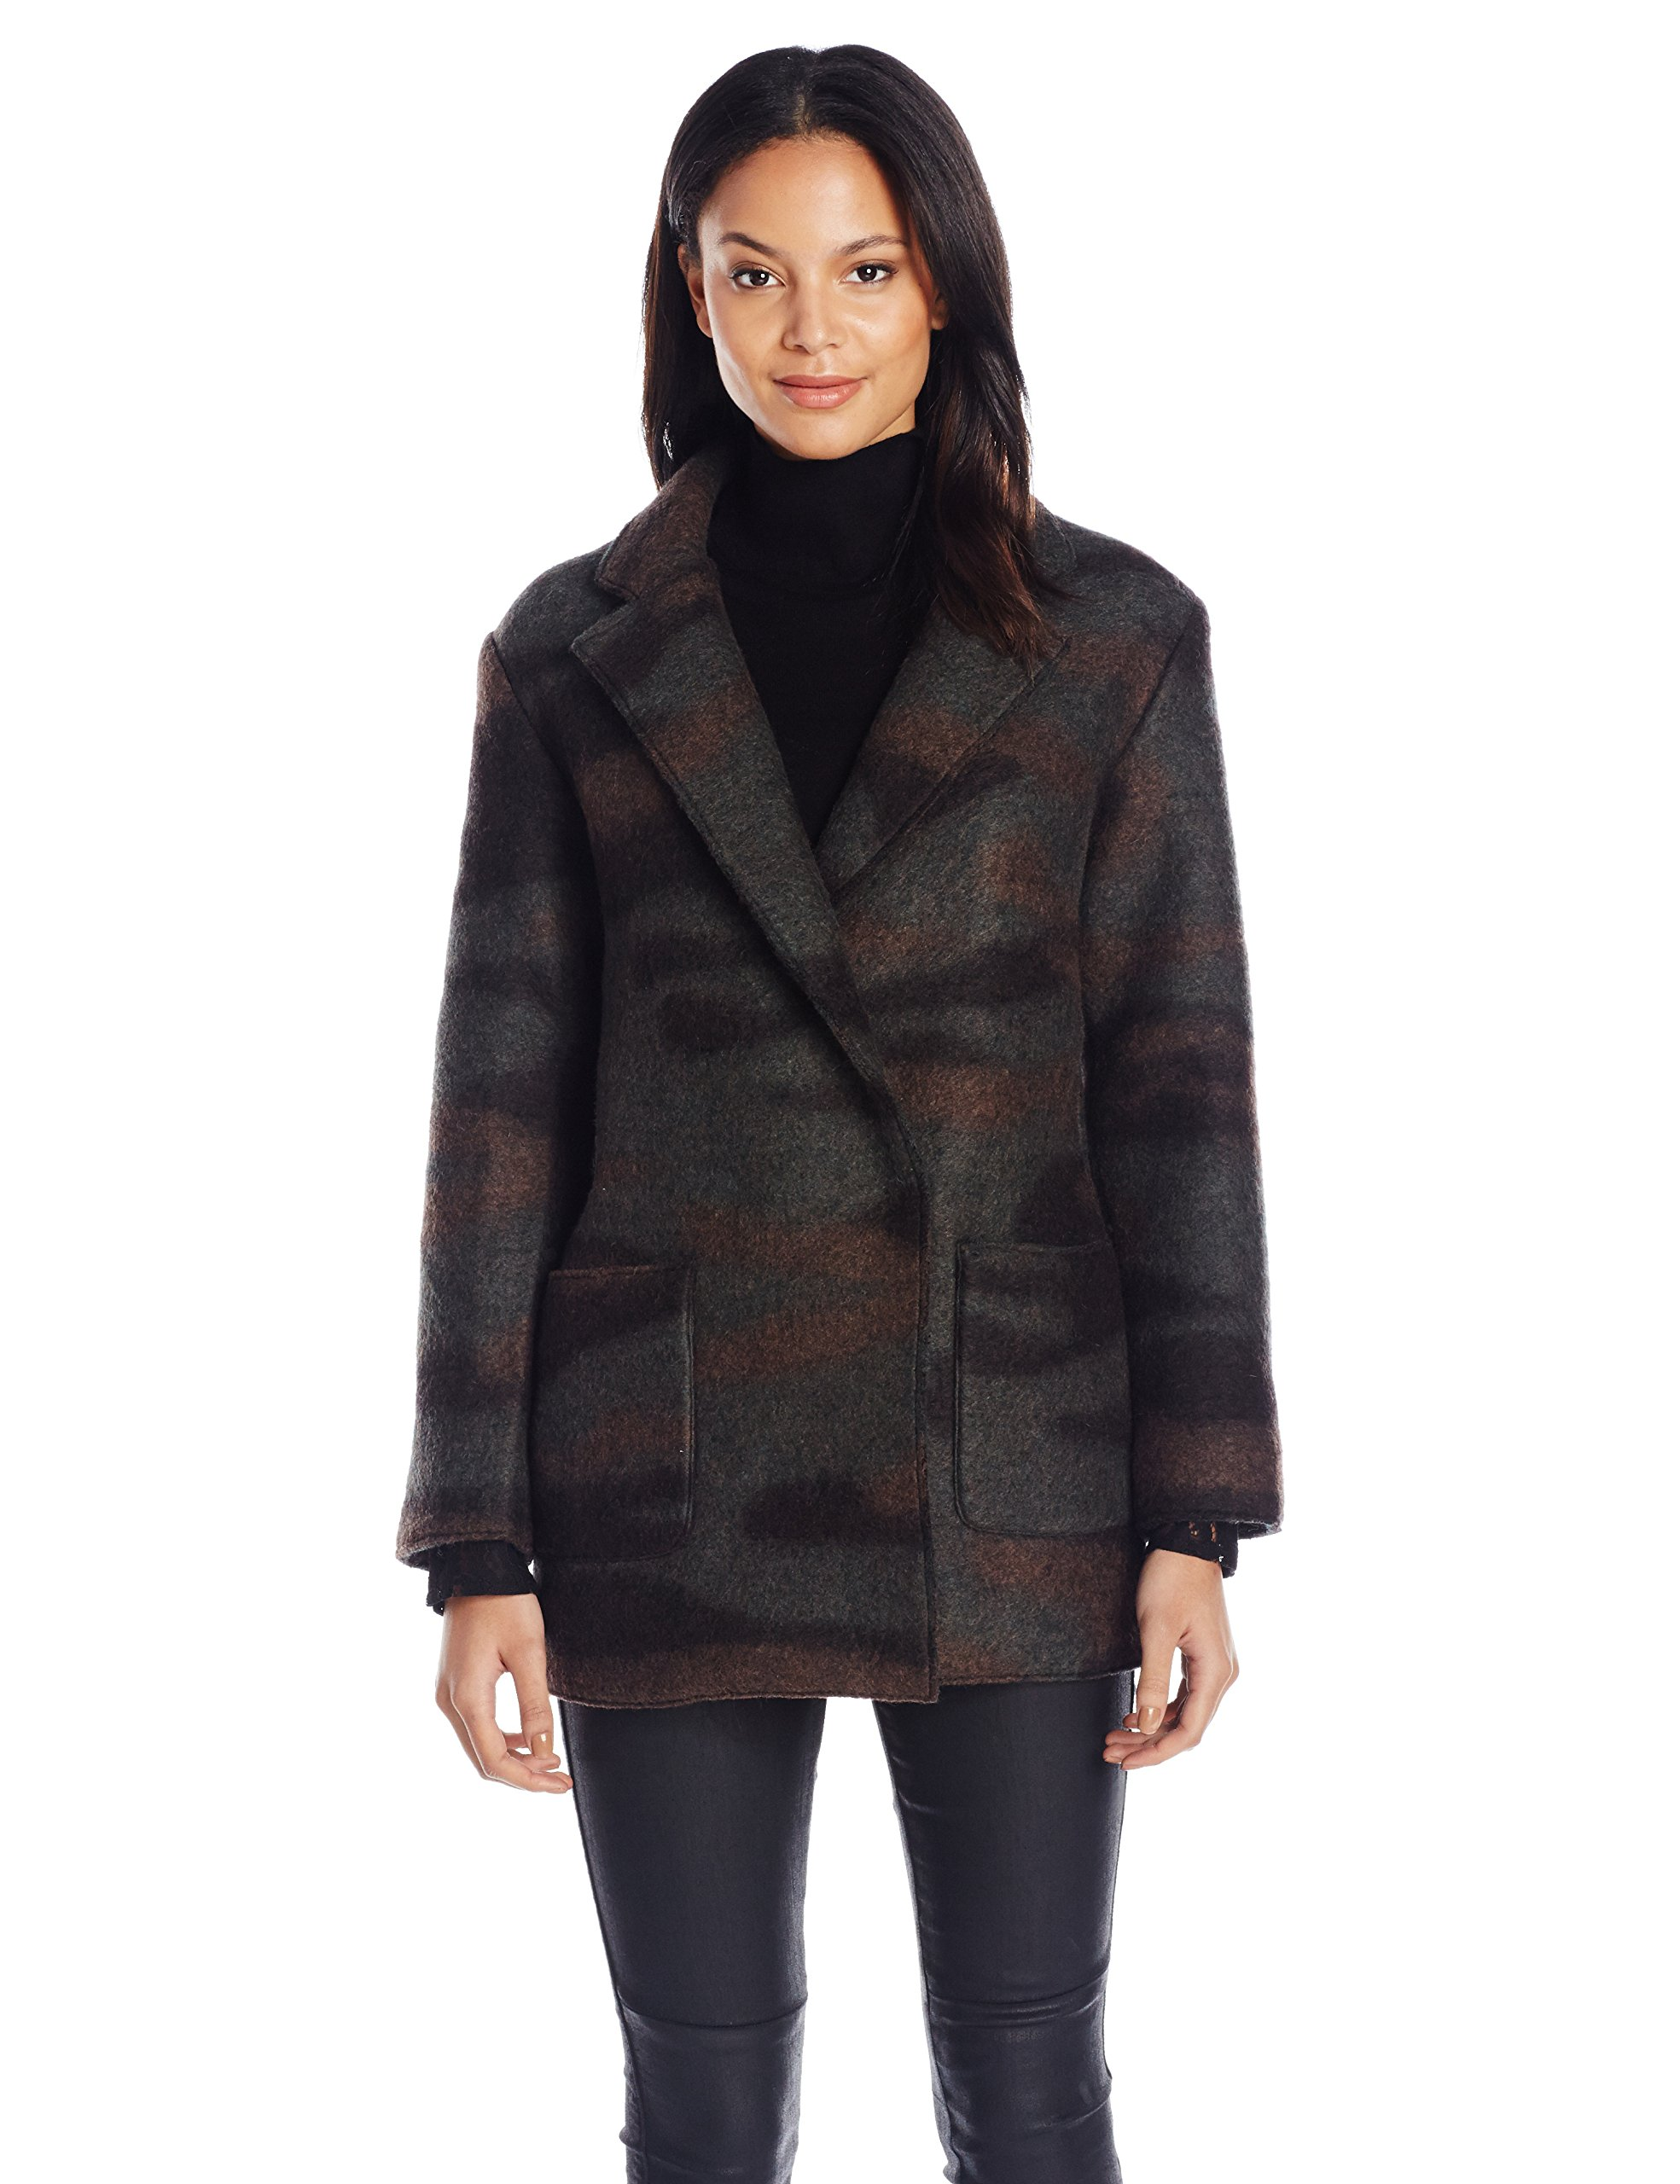 French Connection Women's Camo Felt Coat, Black/Multi, 10